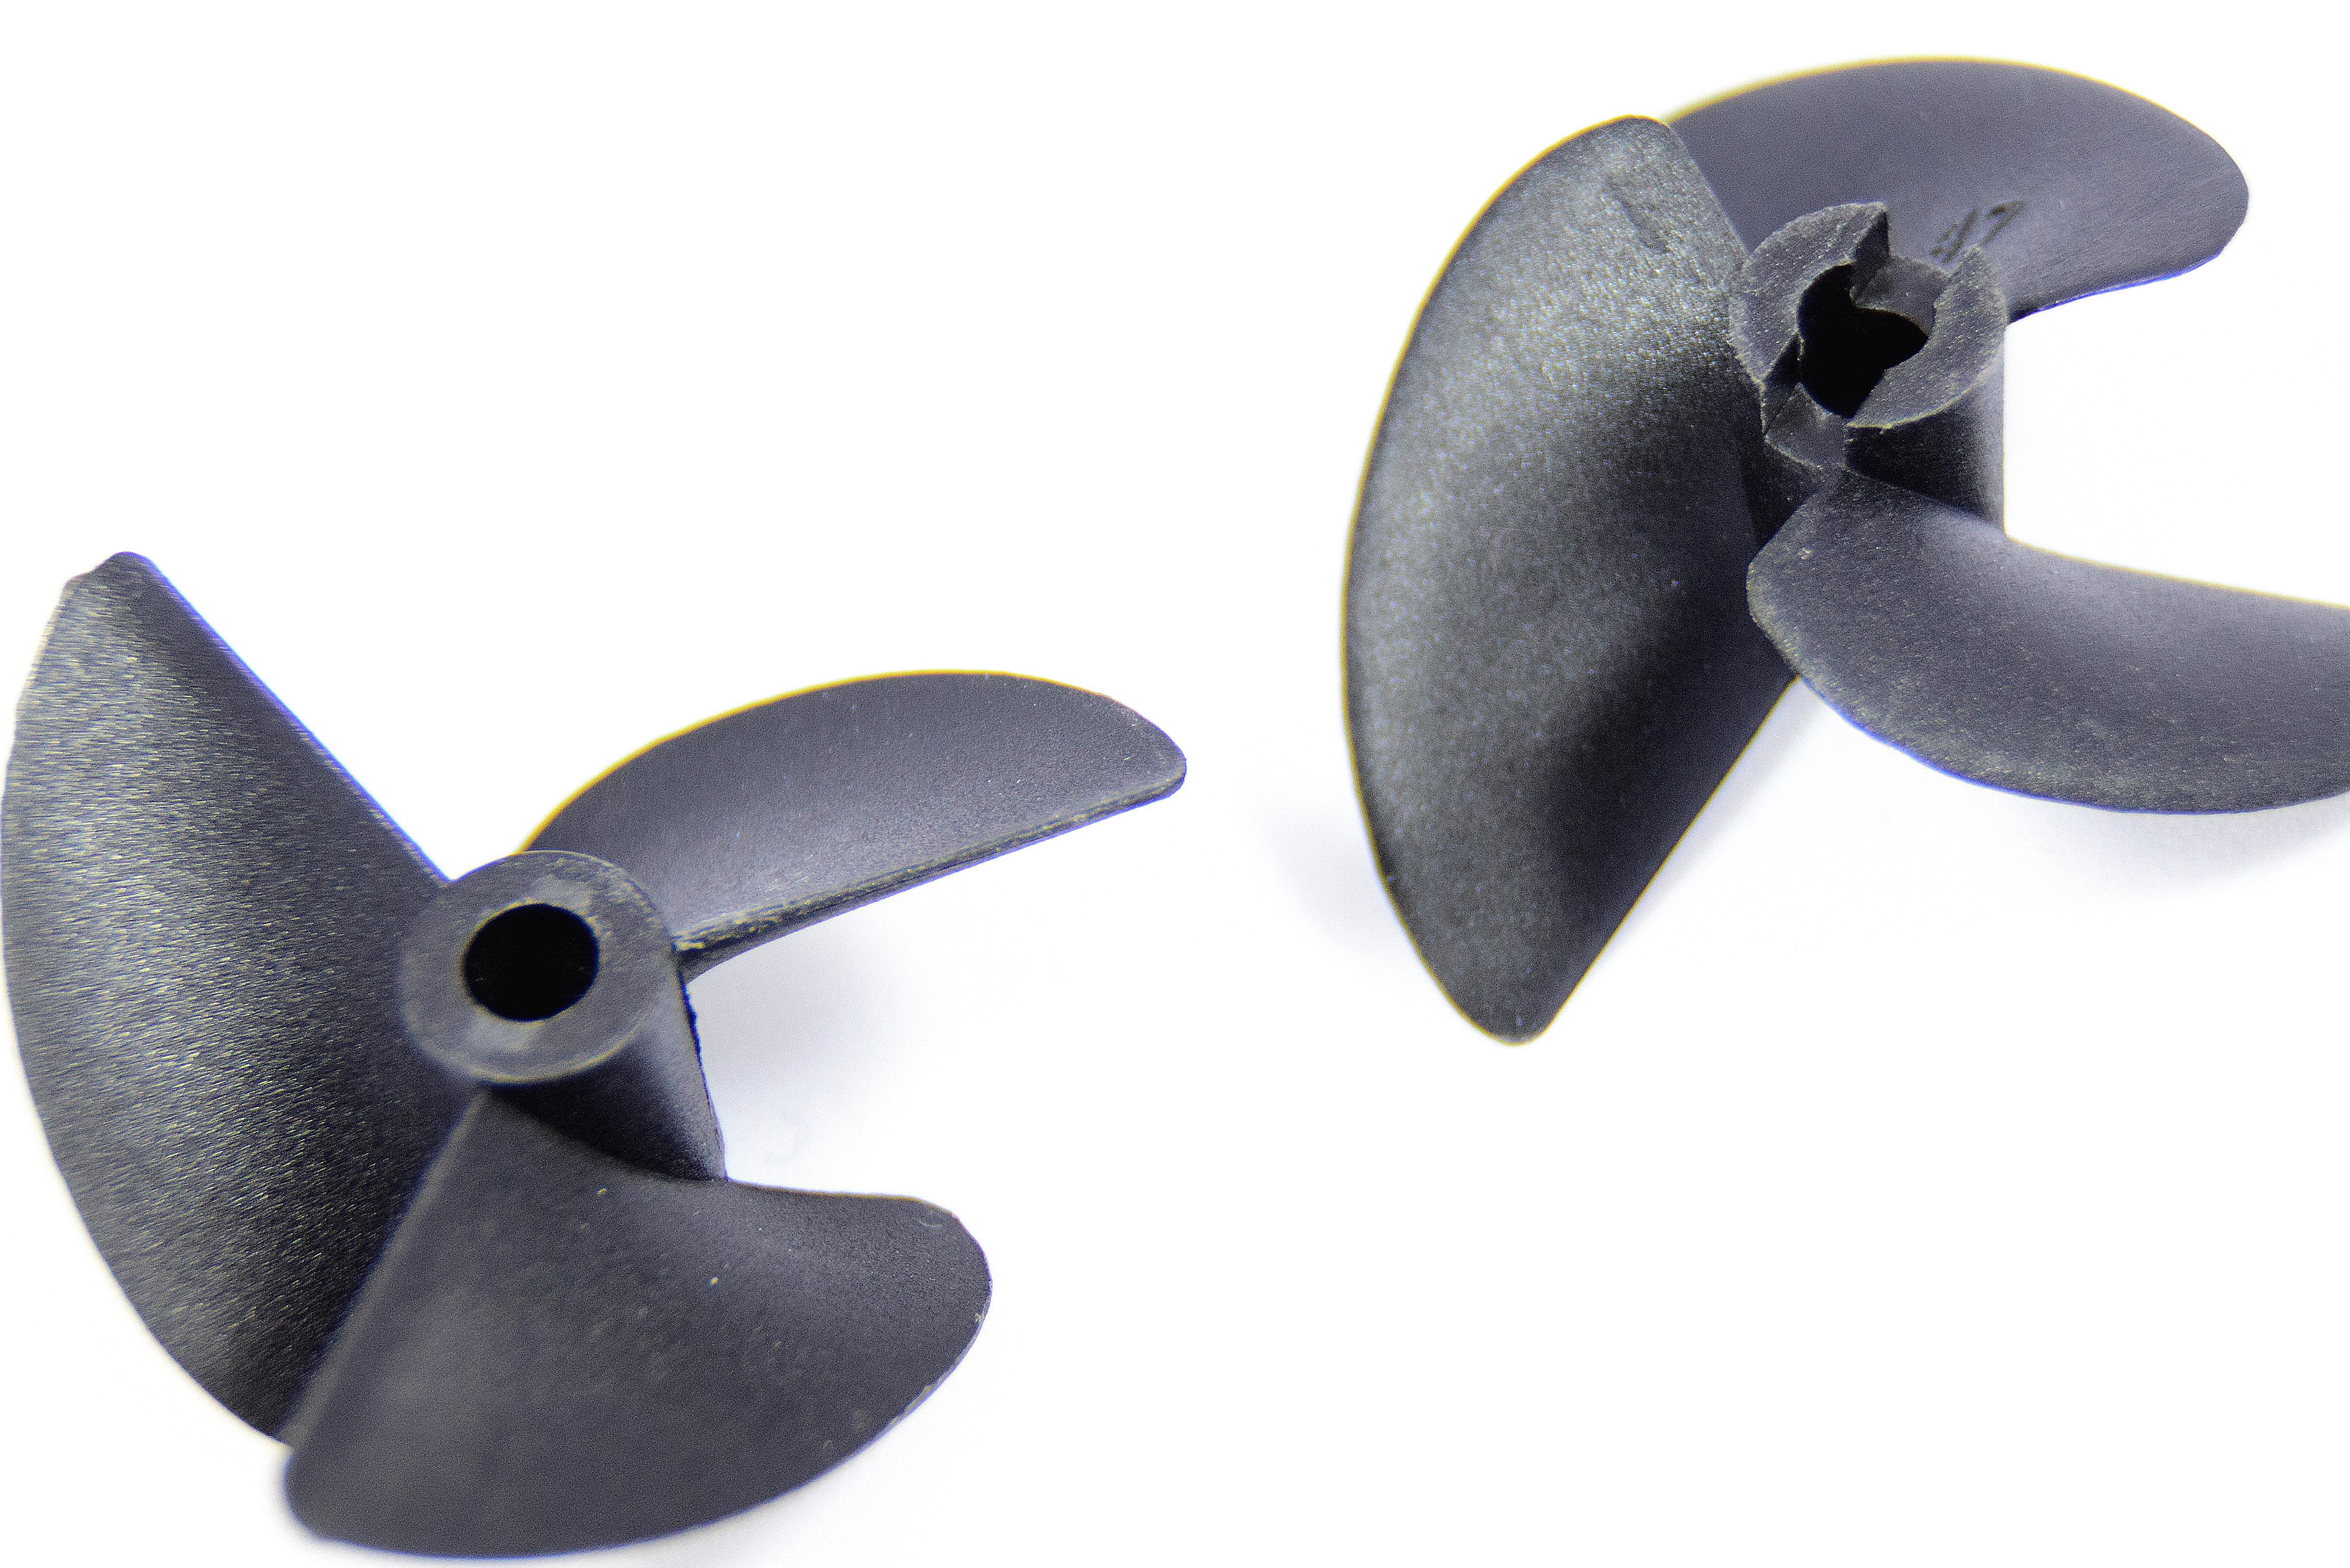 2x schiffsschraube bootspropeller propeller motorboot rc. Black Bedroom Furniture Sets. Home Design Ideas